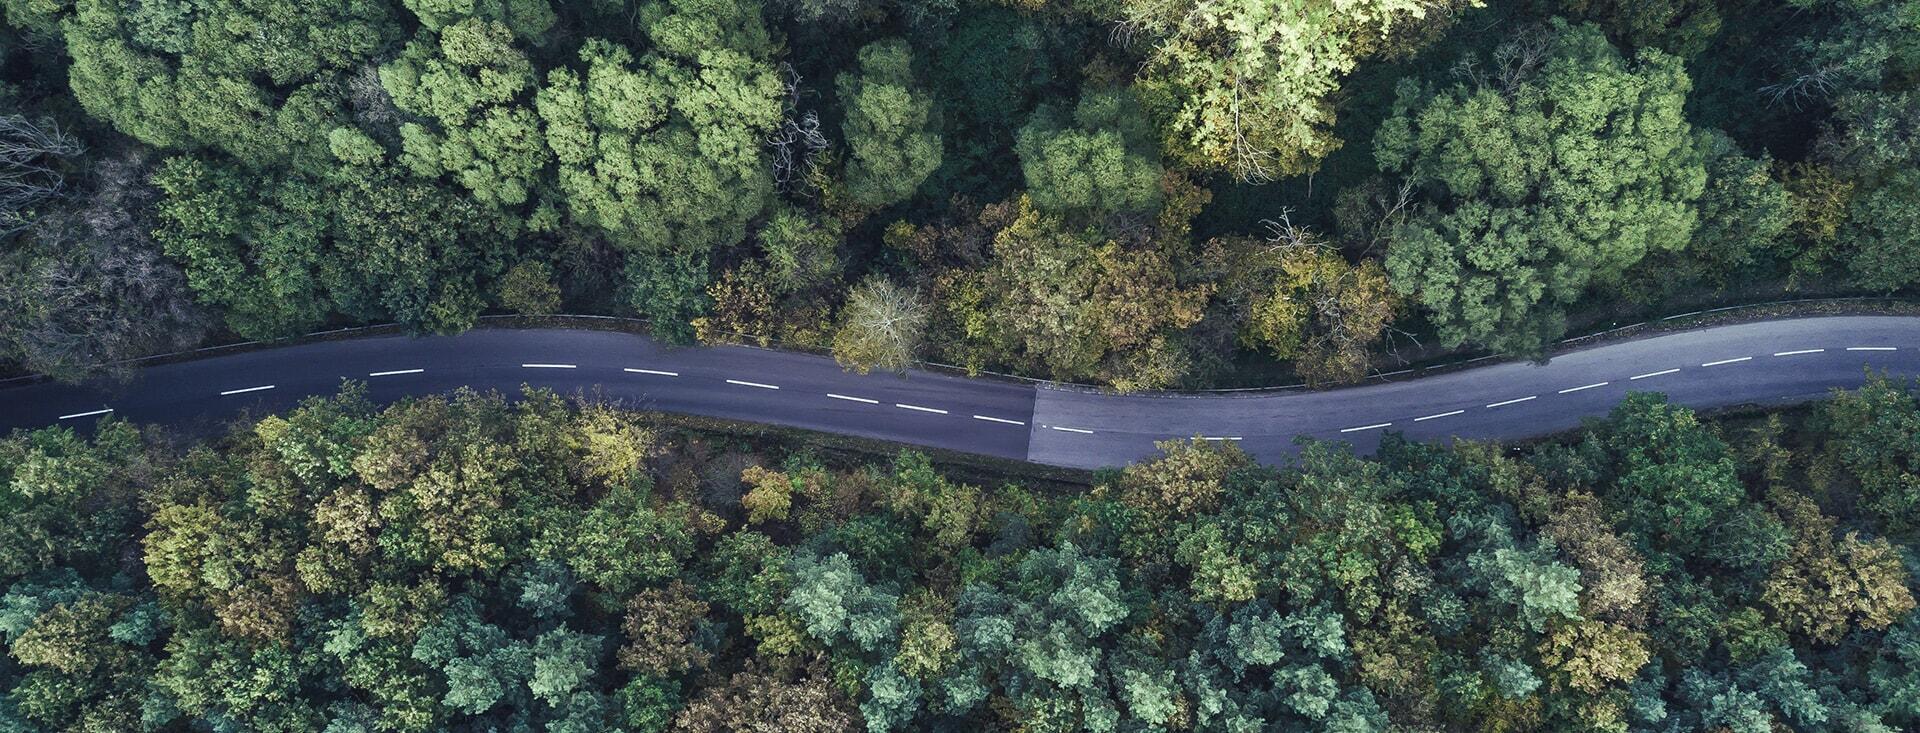 Top down view of winding road through bush